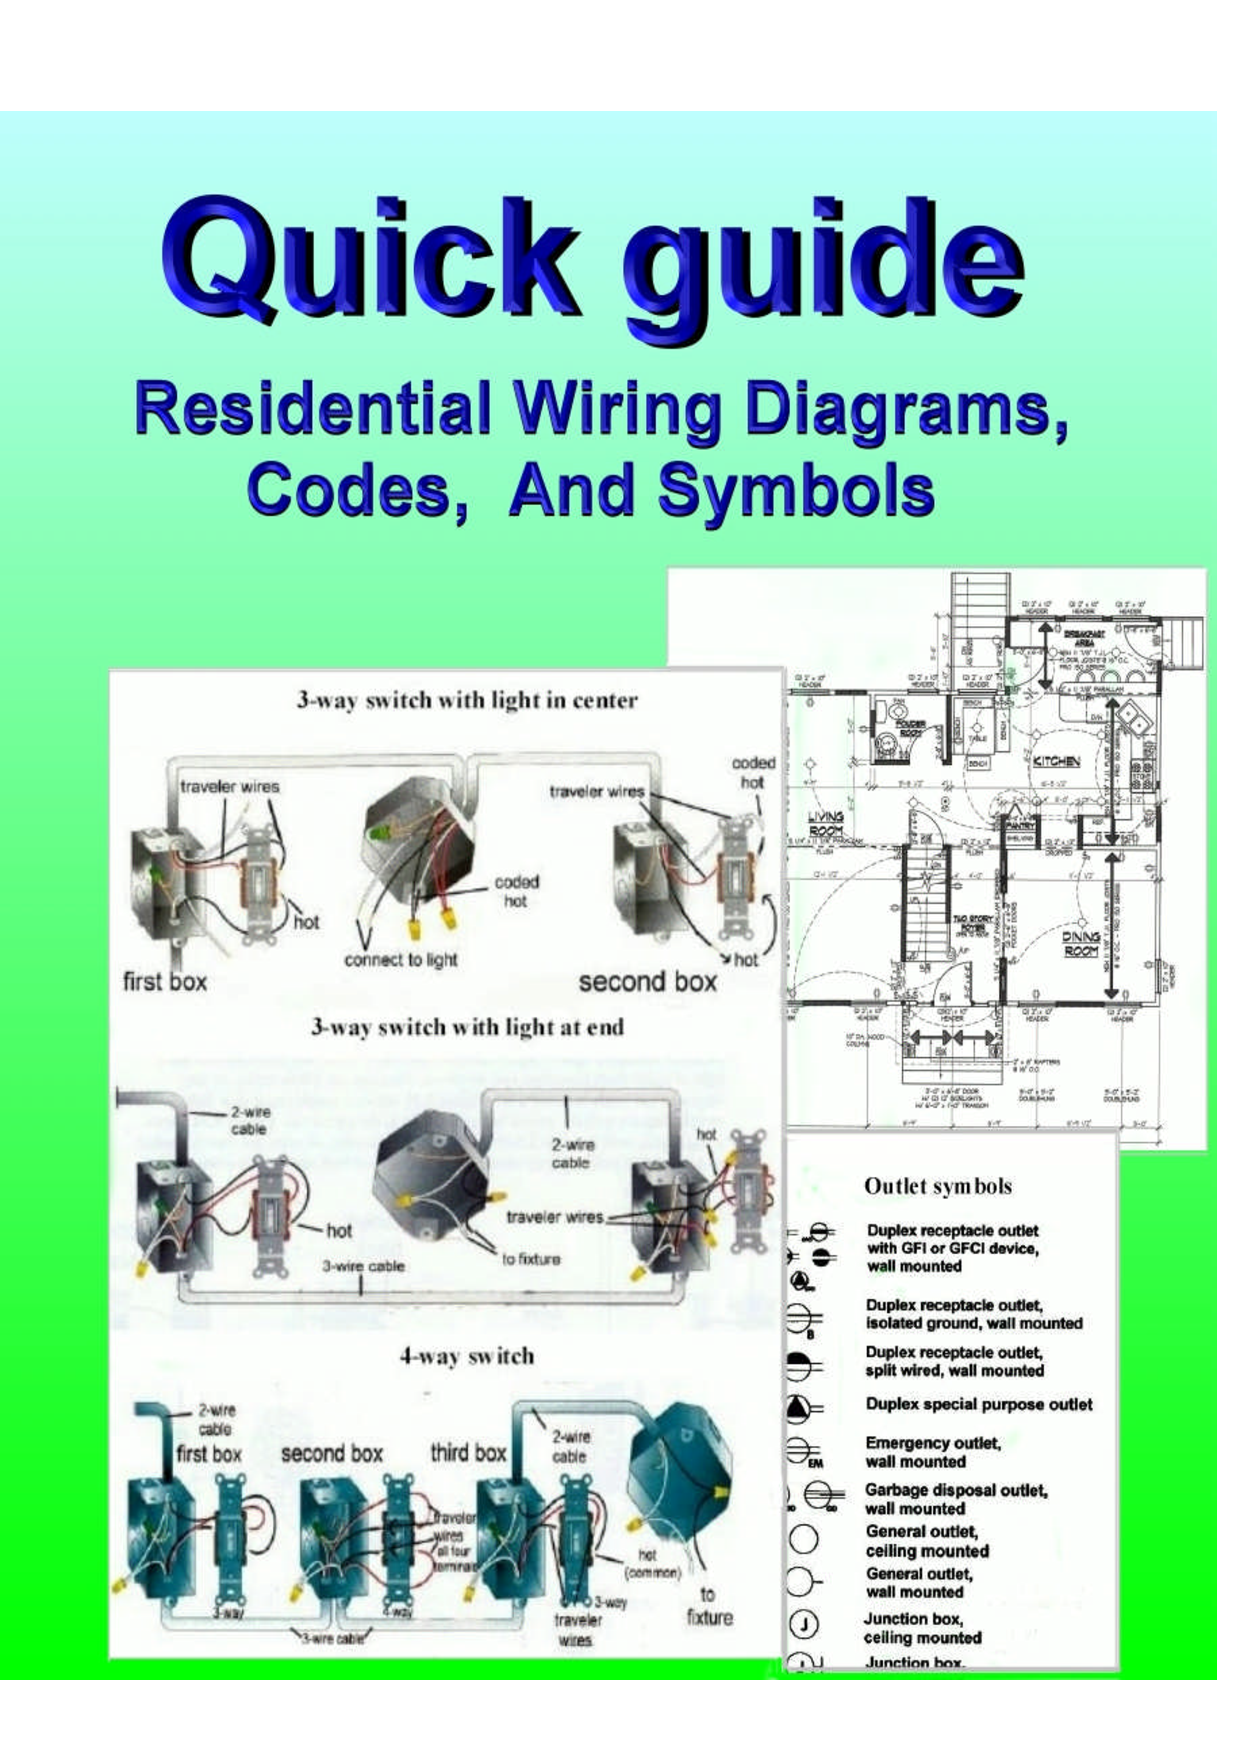 New Household Electric Circuit diagram wiringdiagram